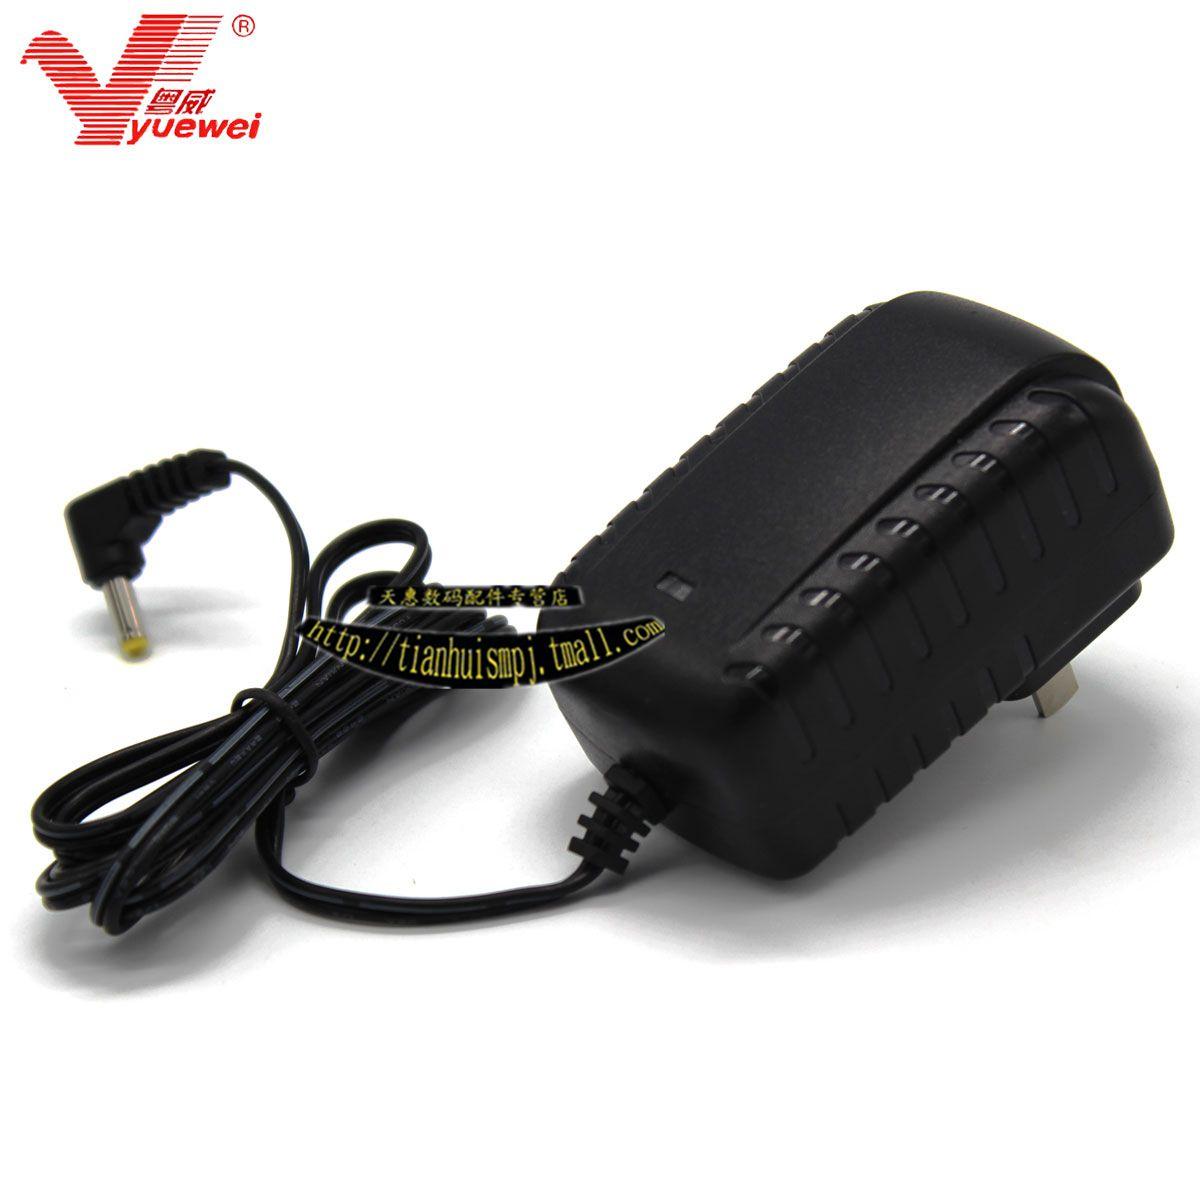 Tmall TMB100A power adapter box Guangdong Wei brand 5V 5V2A transformer for TMB100A power supply